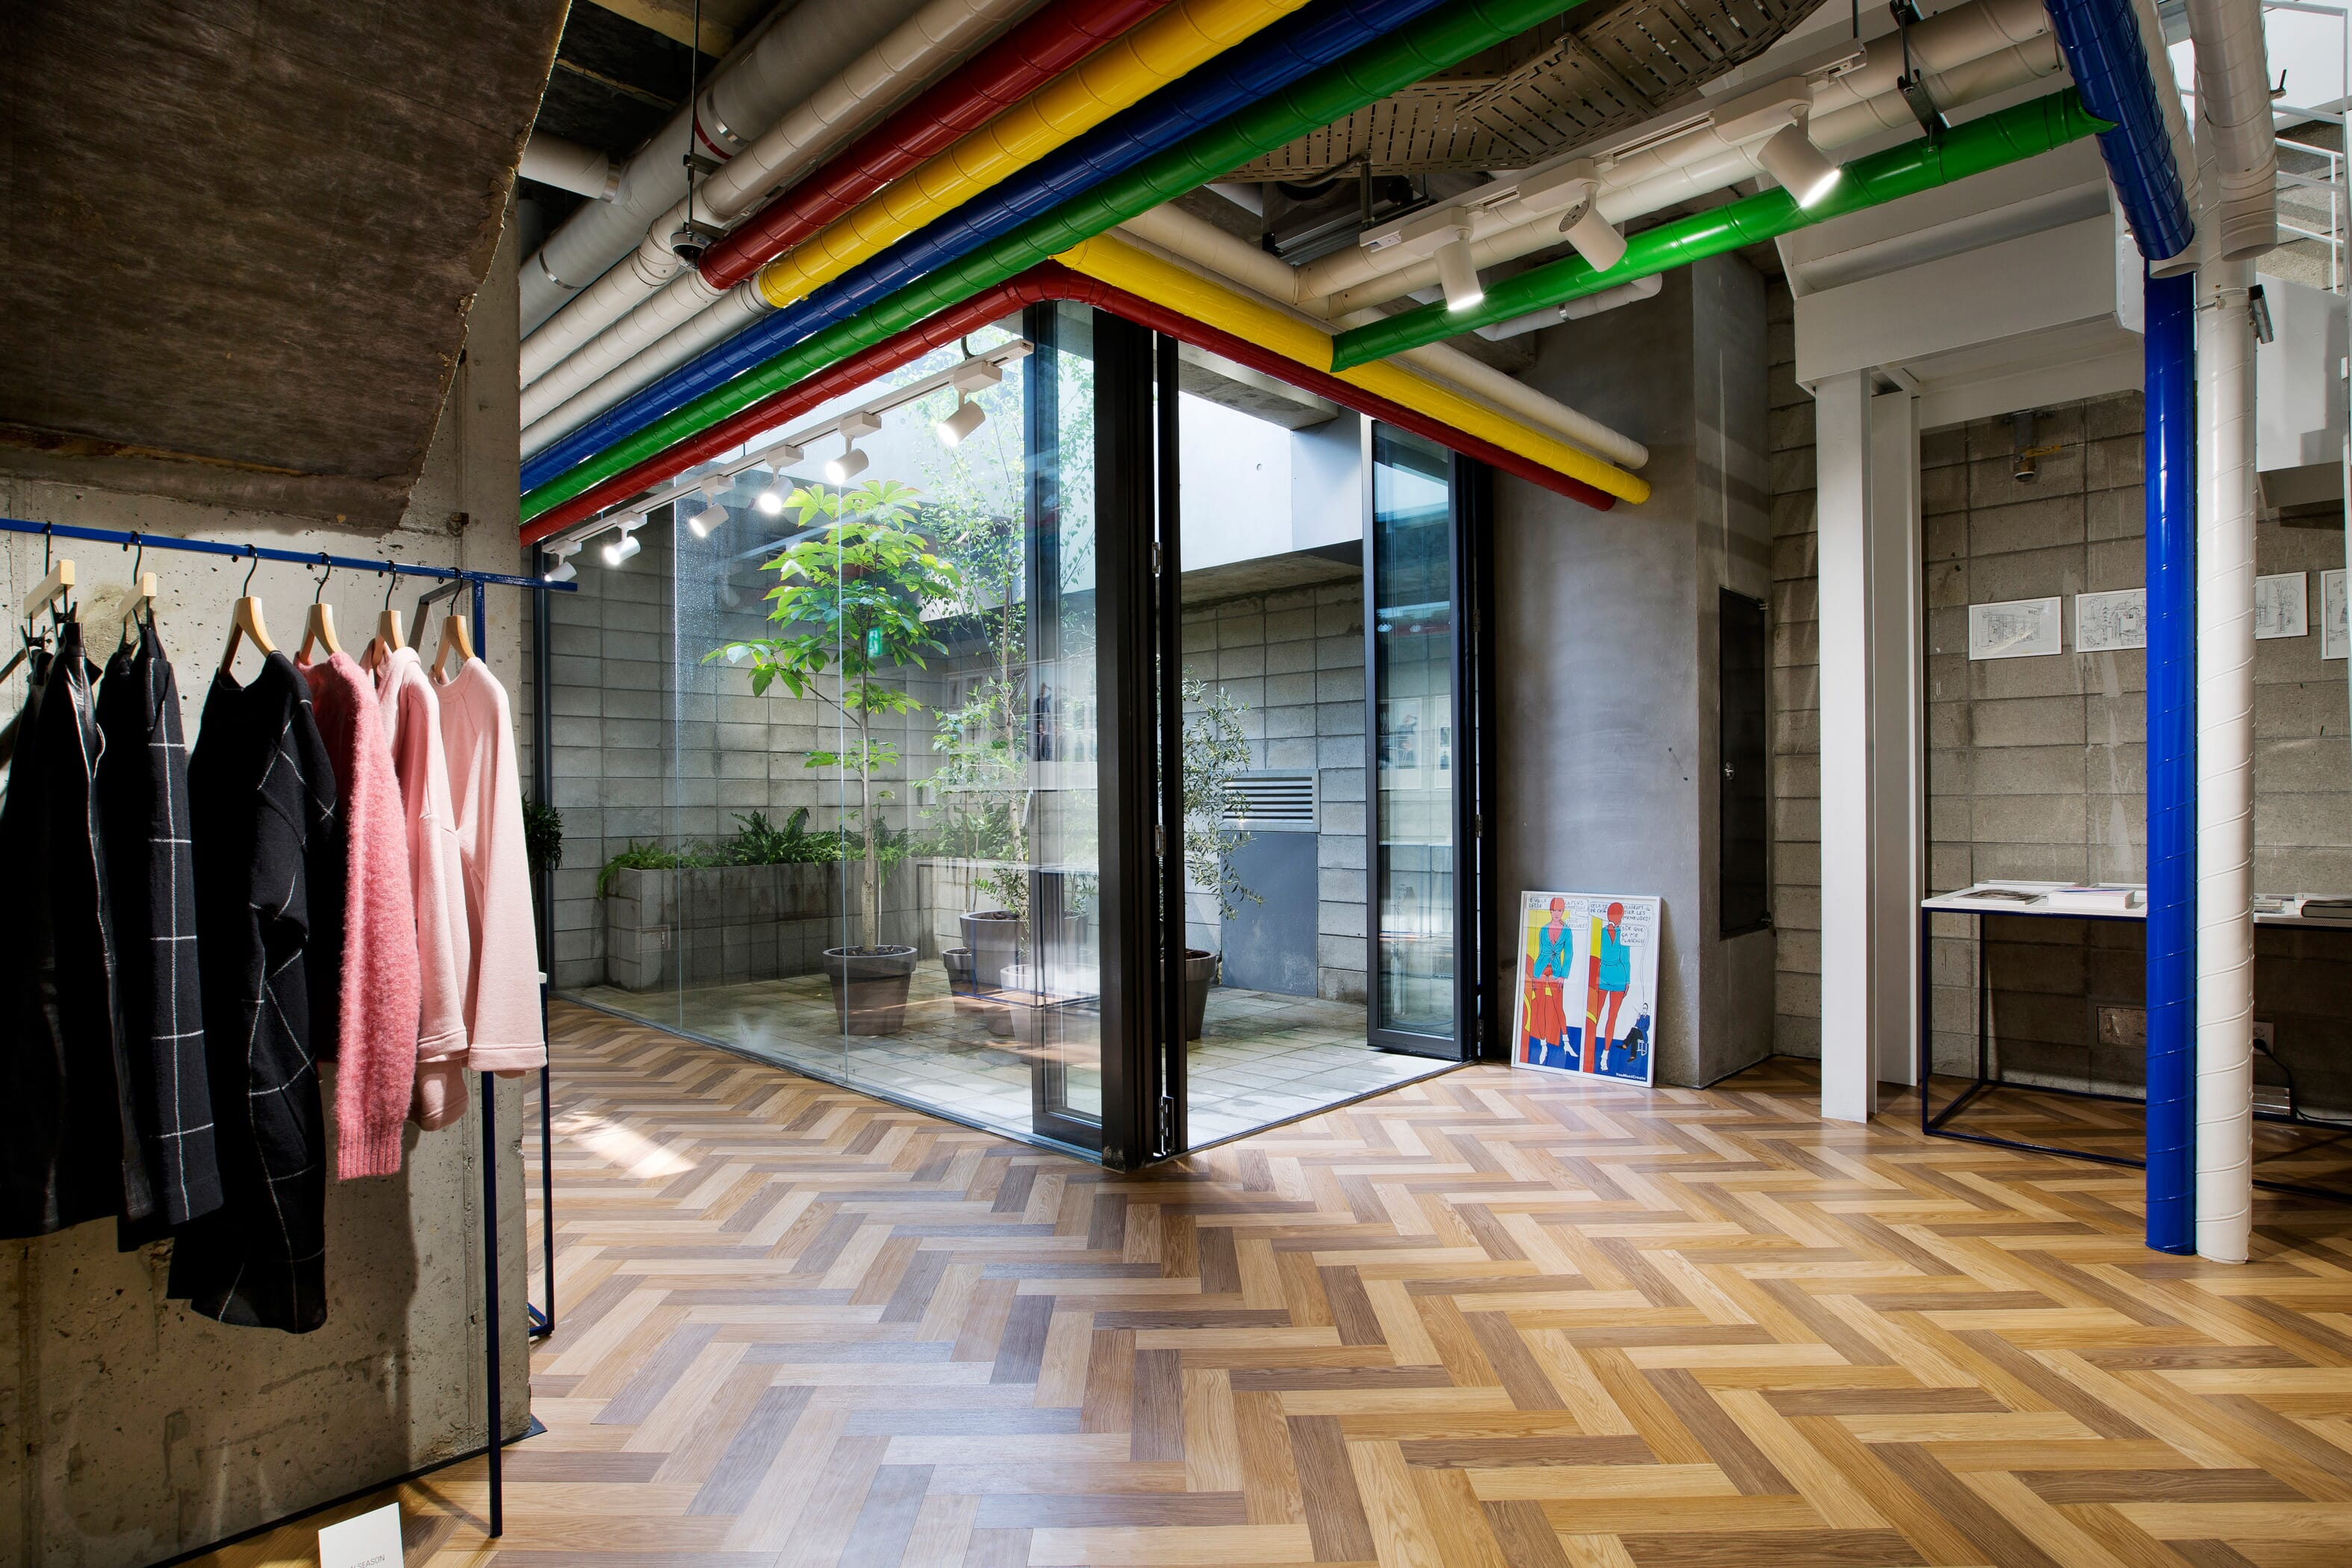 ymc-seoul_aw16-store_interior_b1f_3